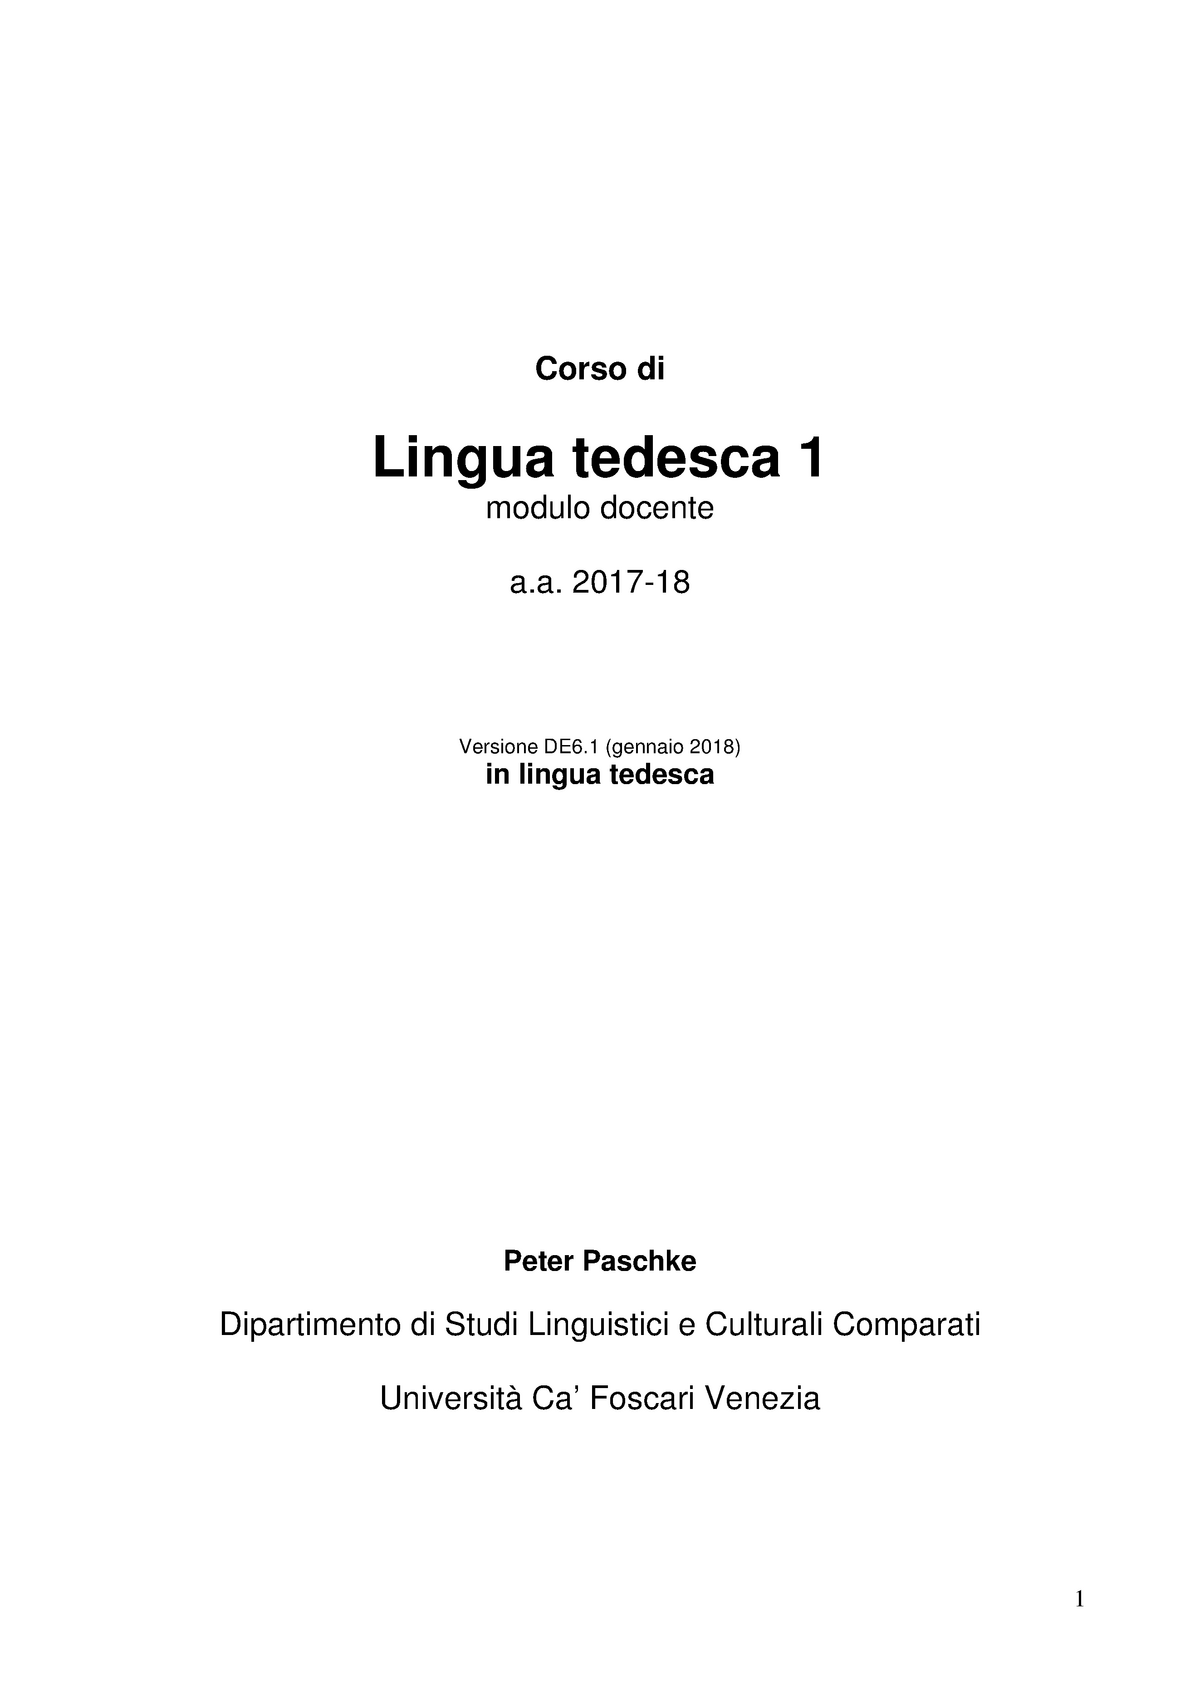 Dispensa Lingua Ted 1paschke 2017 18ver De 6 Lt0052 Studocu